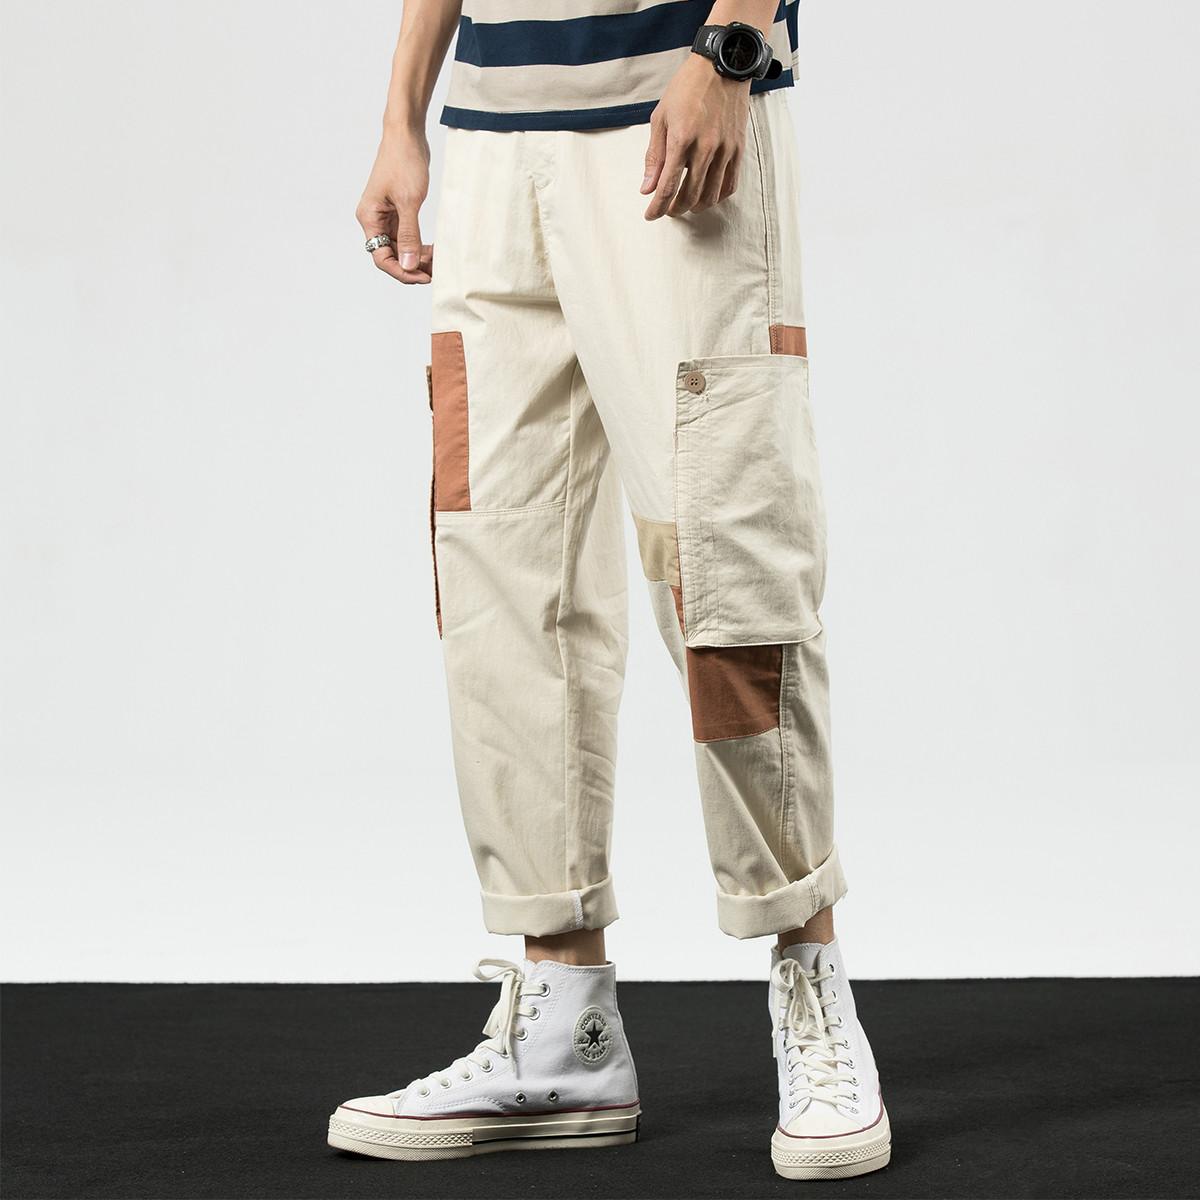 C&A H21212551AANKL 男士休闲裤